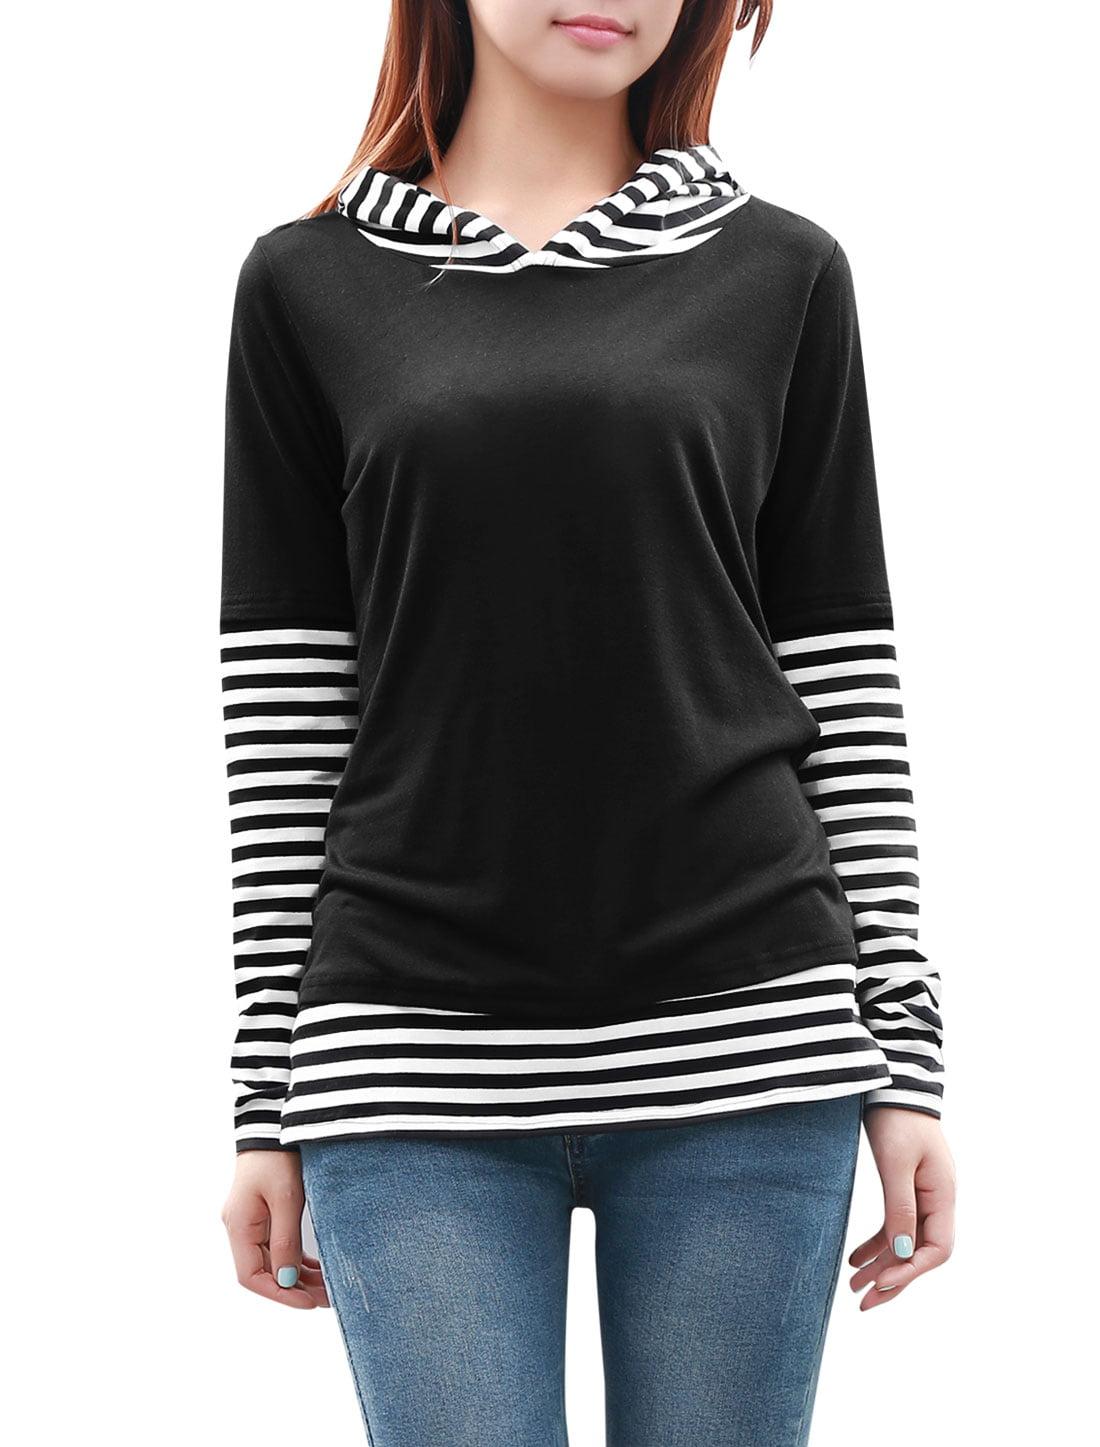 Unique Bargains Women's Pullover Hoodie with Stripe Panel Black (Size M / 8)